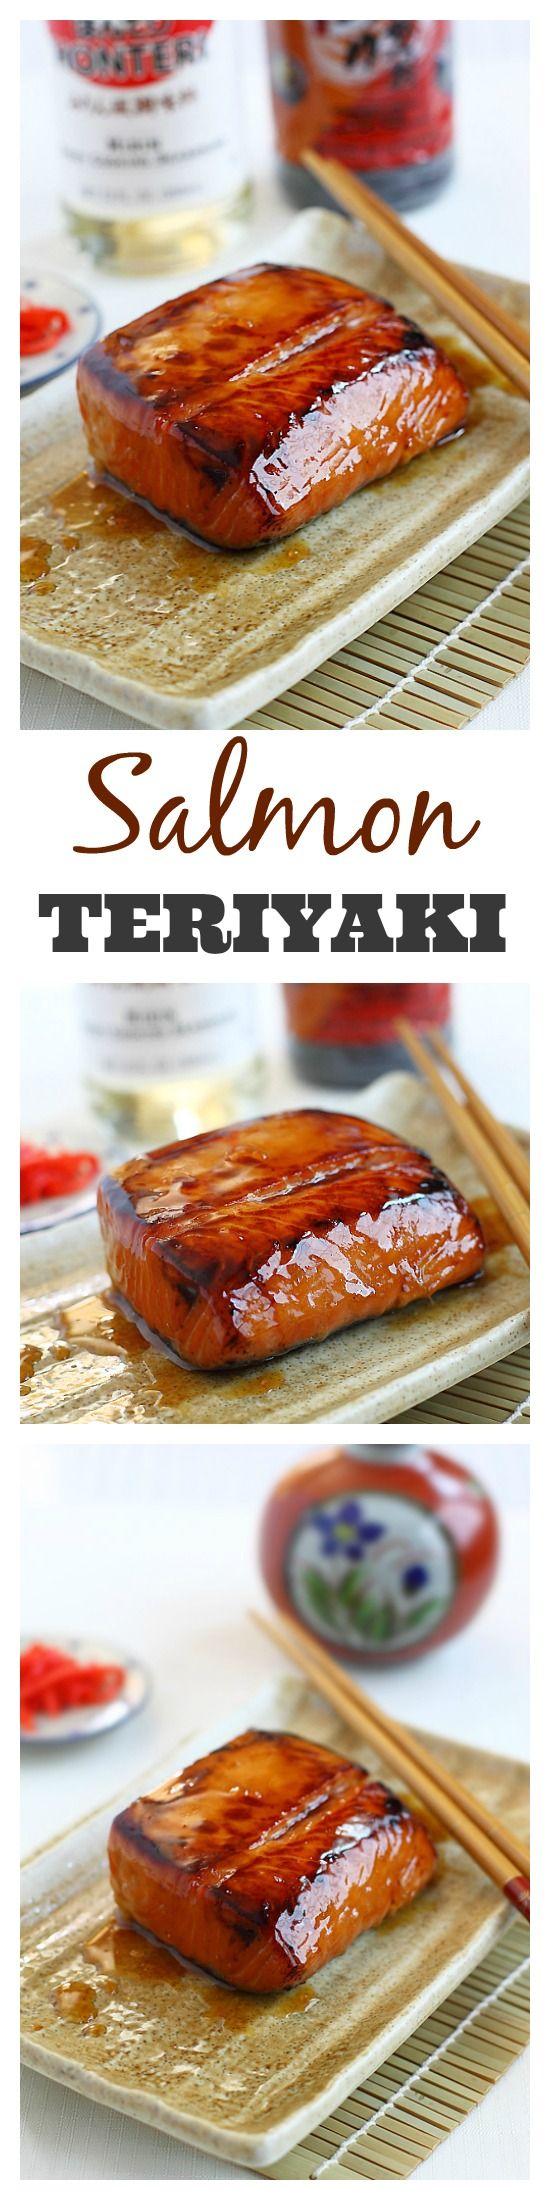 Salmon teriyaki recipe. Super easy, simple ingredients, amazing, and healthy | rasamalaysia.com